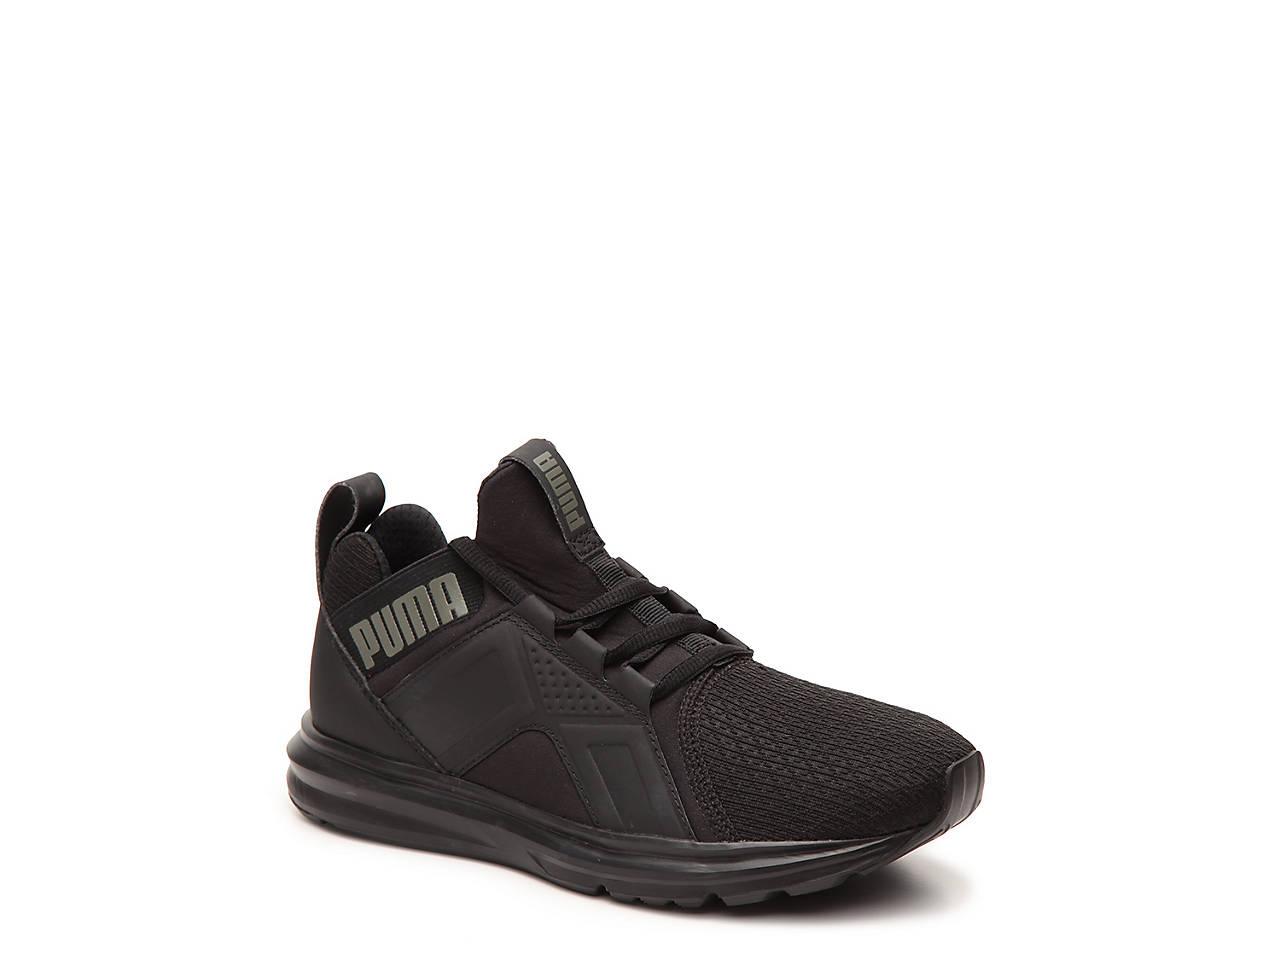 43ad96c2c7a2 Puma Enzo JR Youth Sneaker Kids Shoes